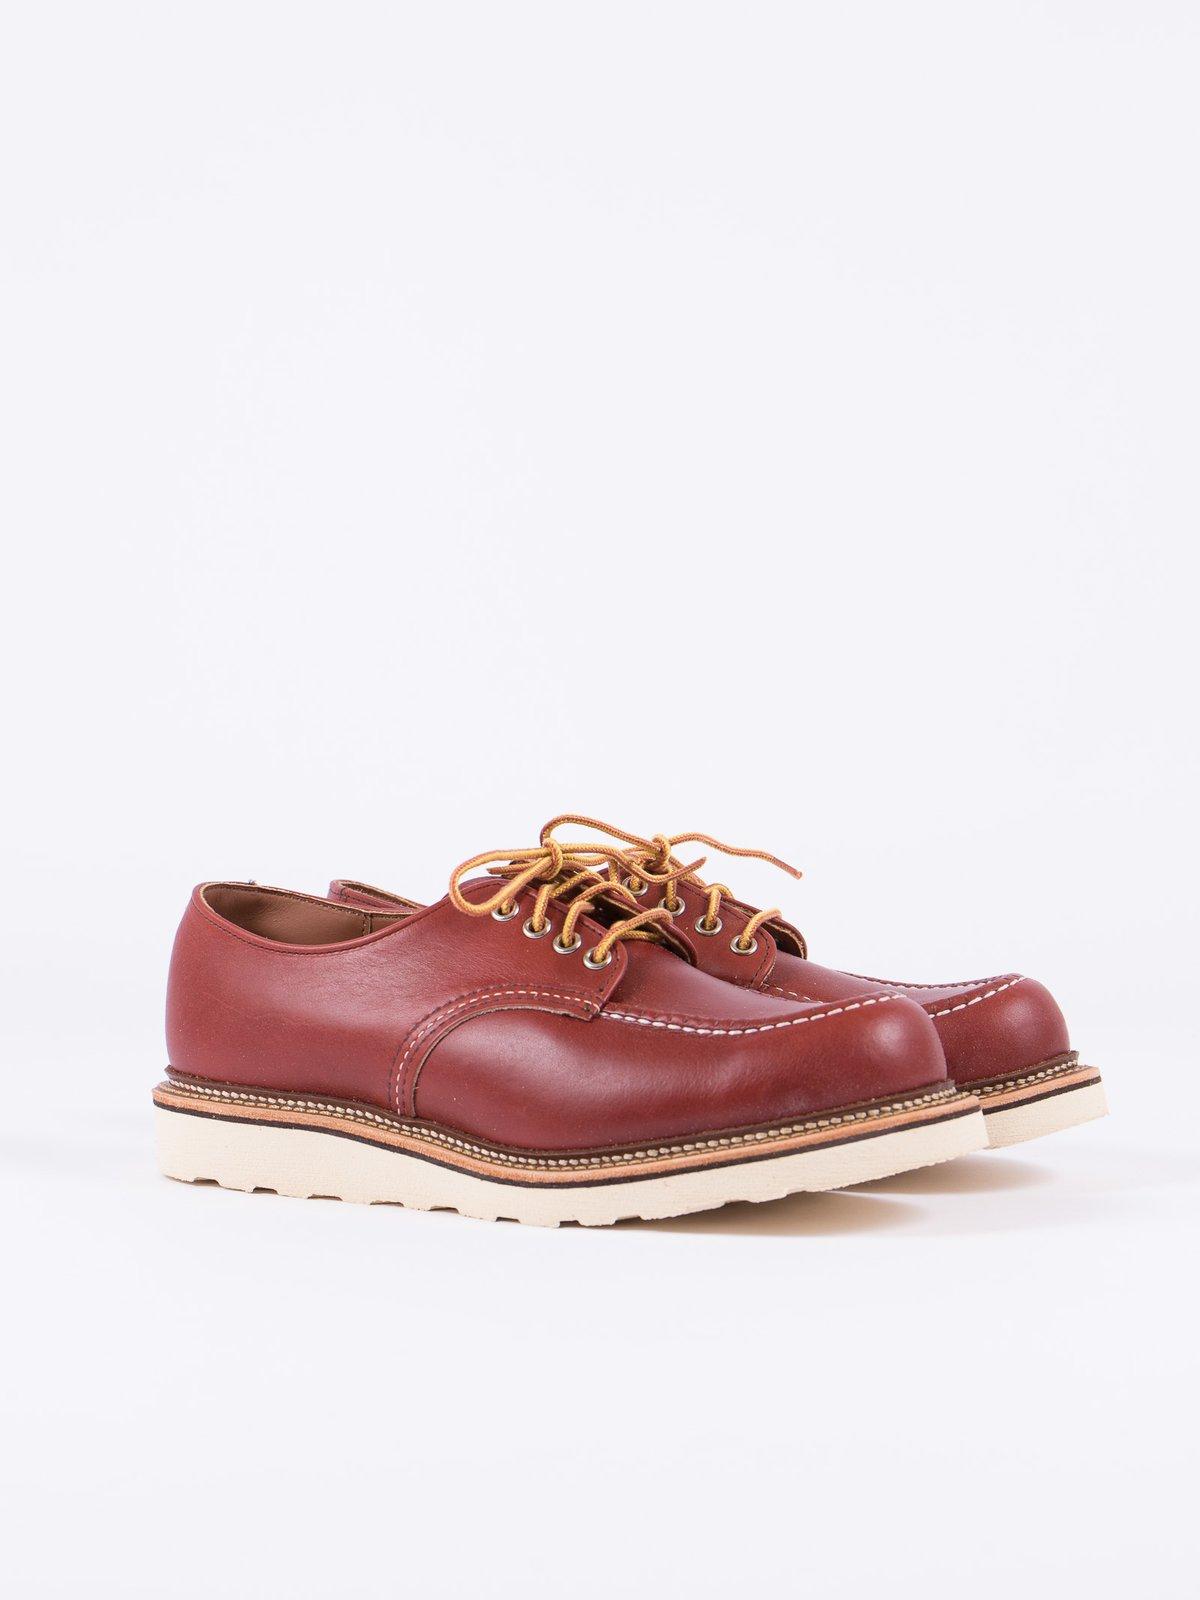 Oro Russet Portage 8103 Classic Oxford Shoe - Image 1